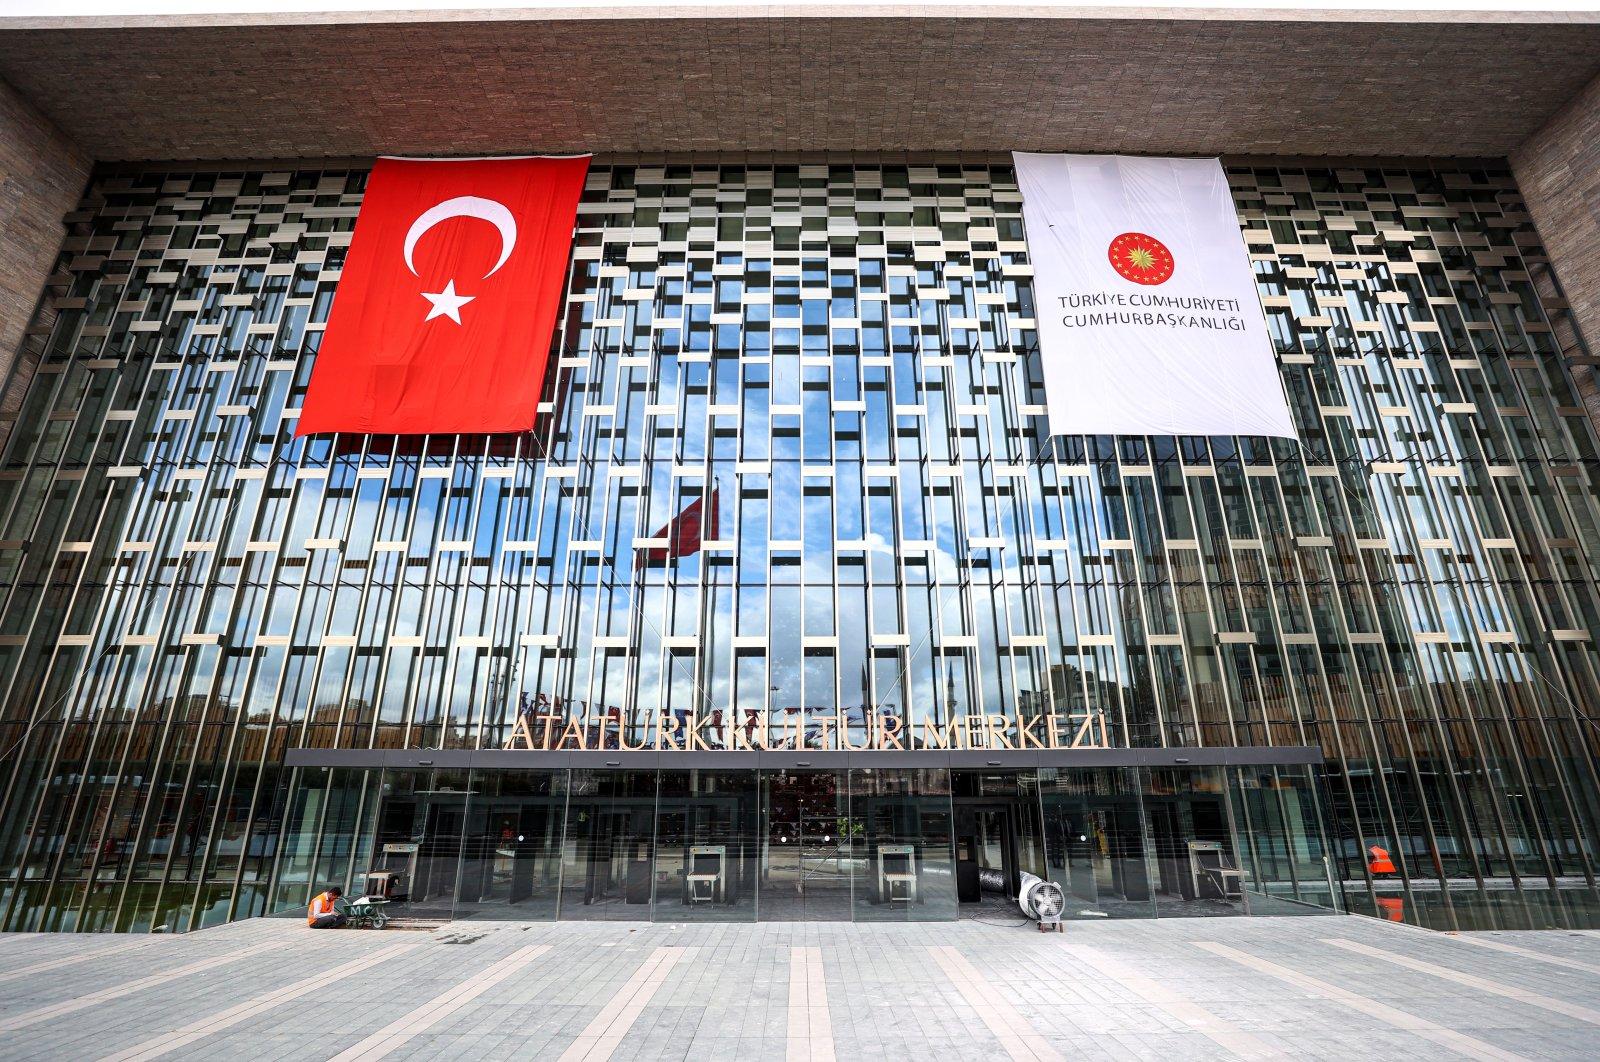 The entrance of theAtatürk Cultural Center (AKM) in Taksim, Istanbul, Turkey, Oct. 1, 2021. (AA Photo)